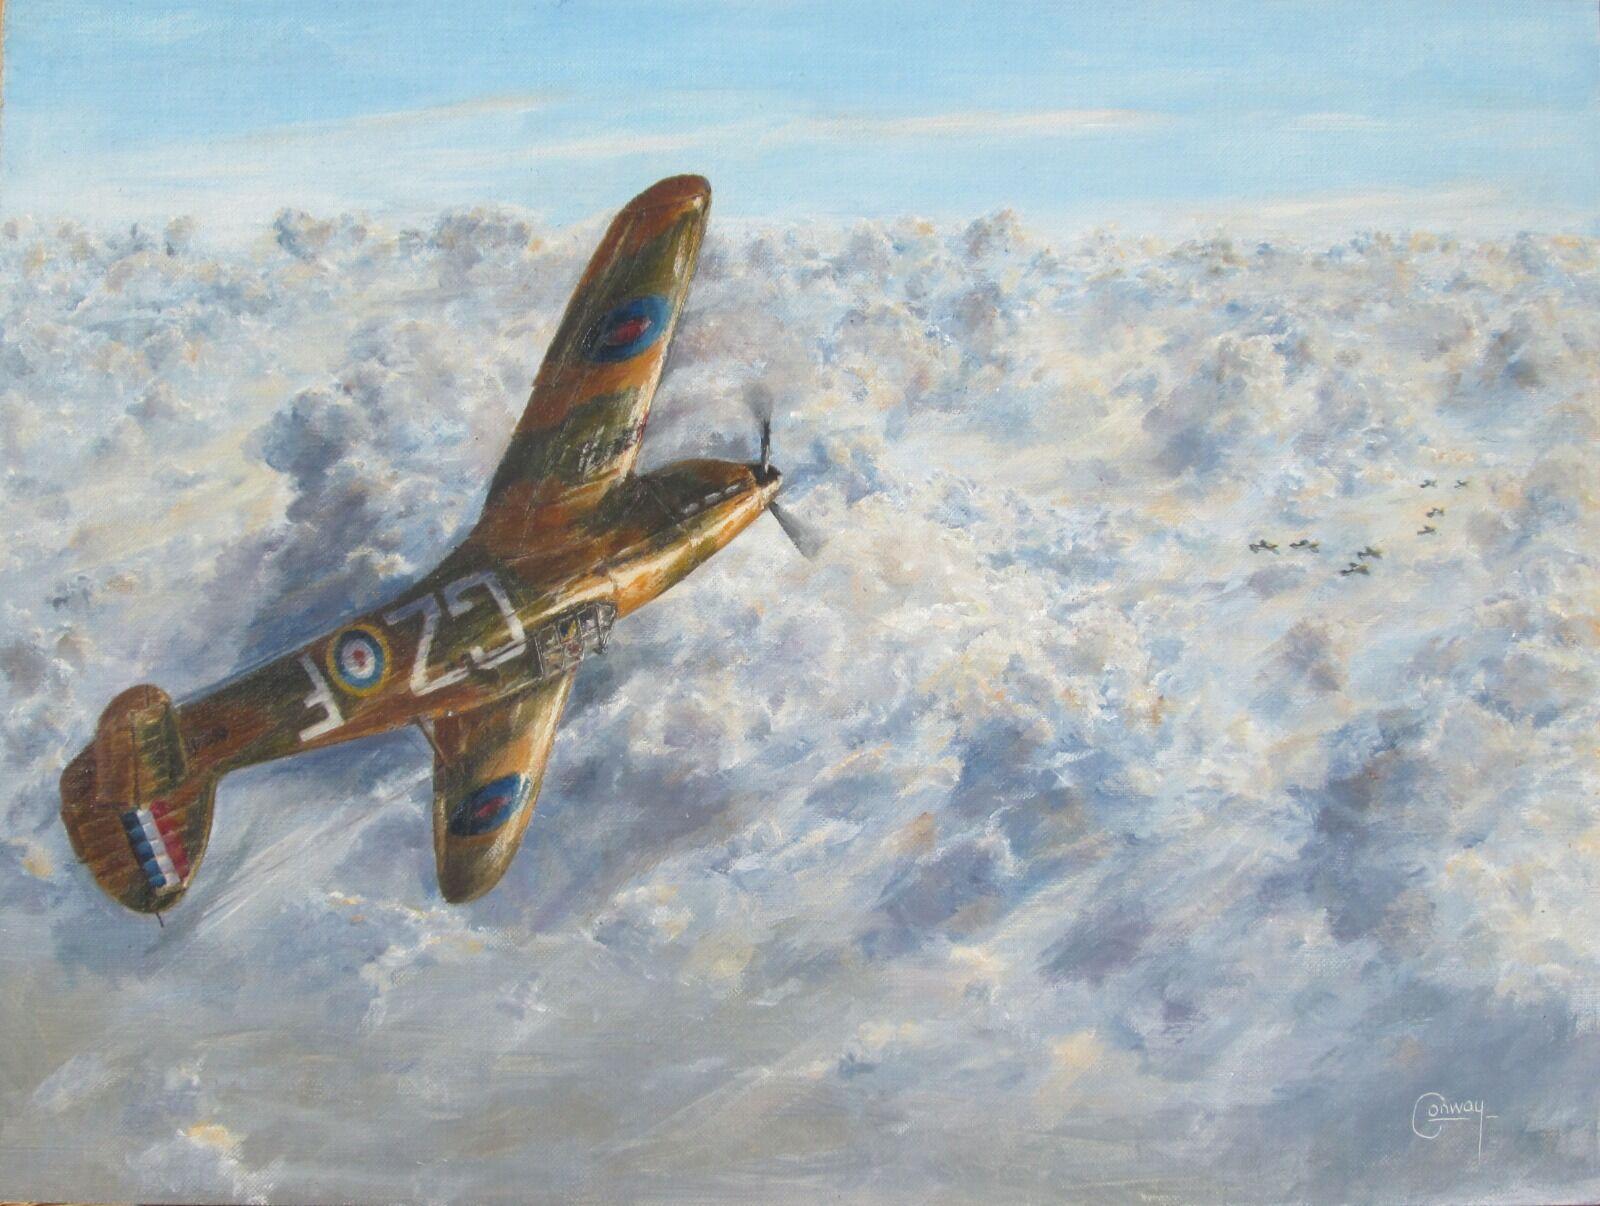 """A Tangle with some 109s""- Hurricane of Sq/L. Micheal Nicholson Crossley, No. 32 Squadron"